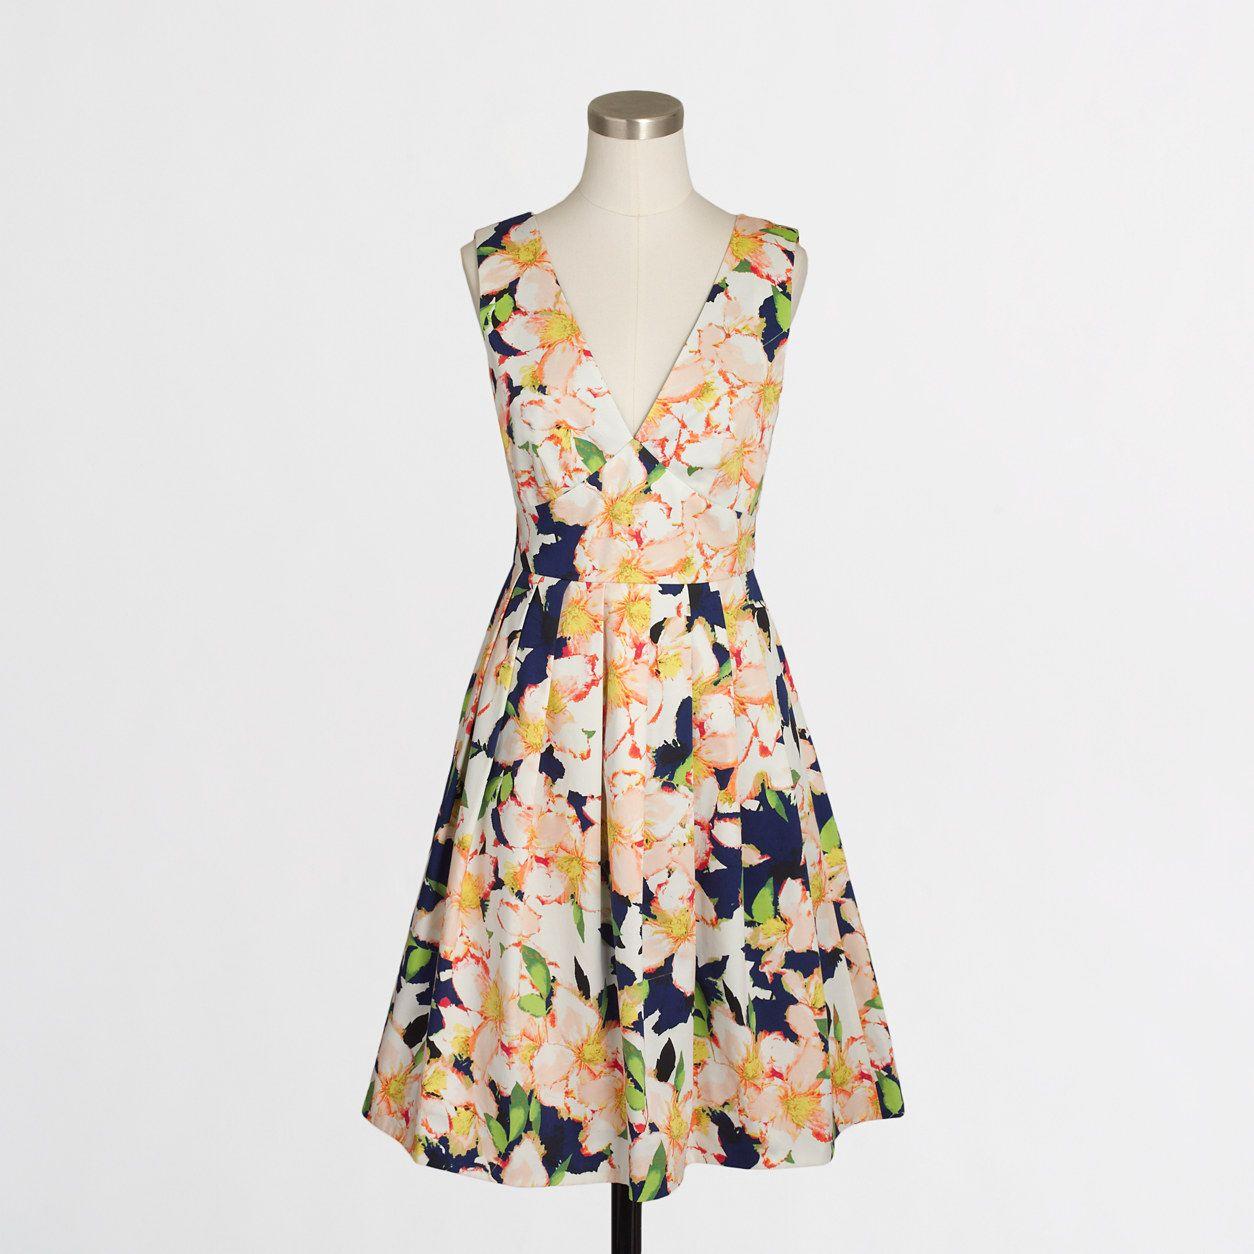 639230c7c75 Sateen V-neck dress in floral   FactoryWomen Party Dresses